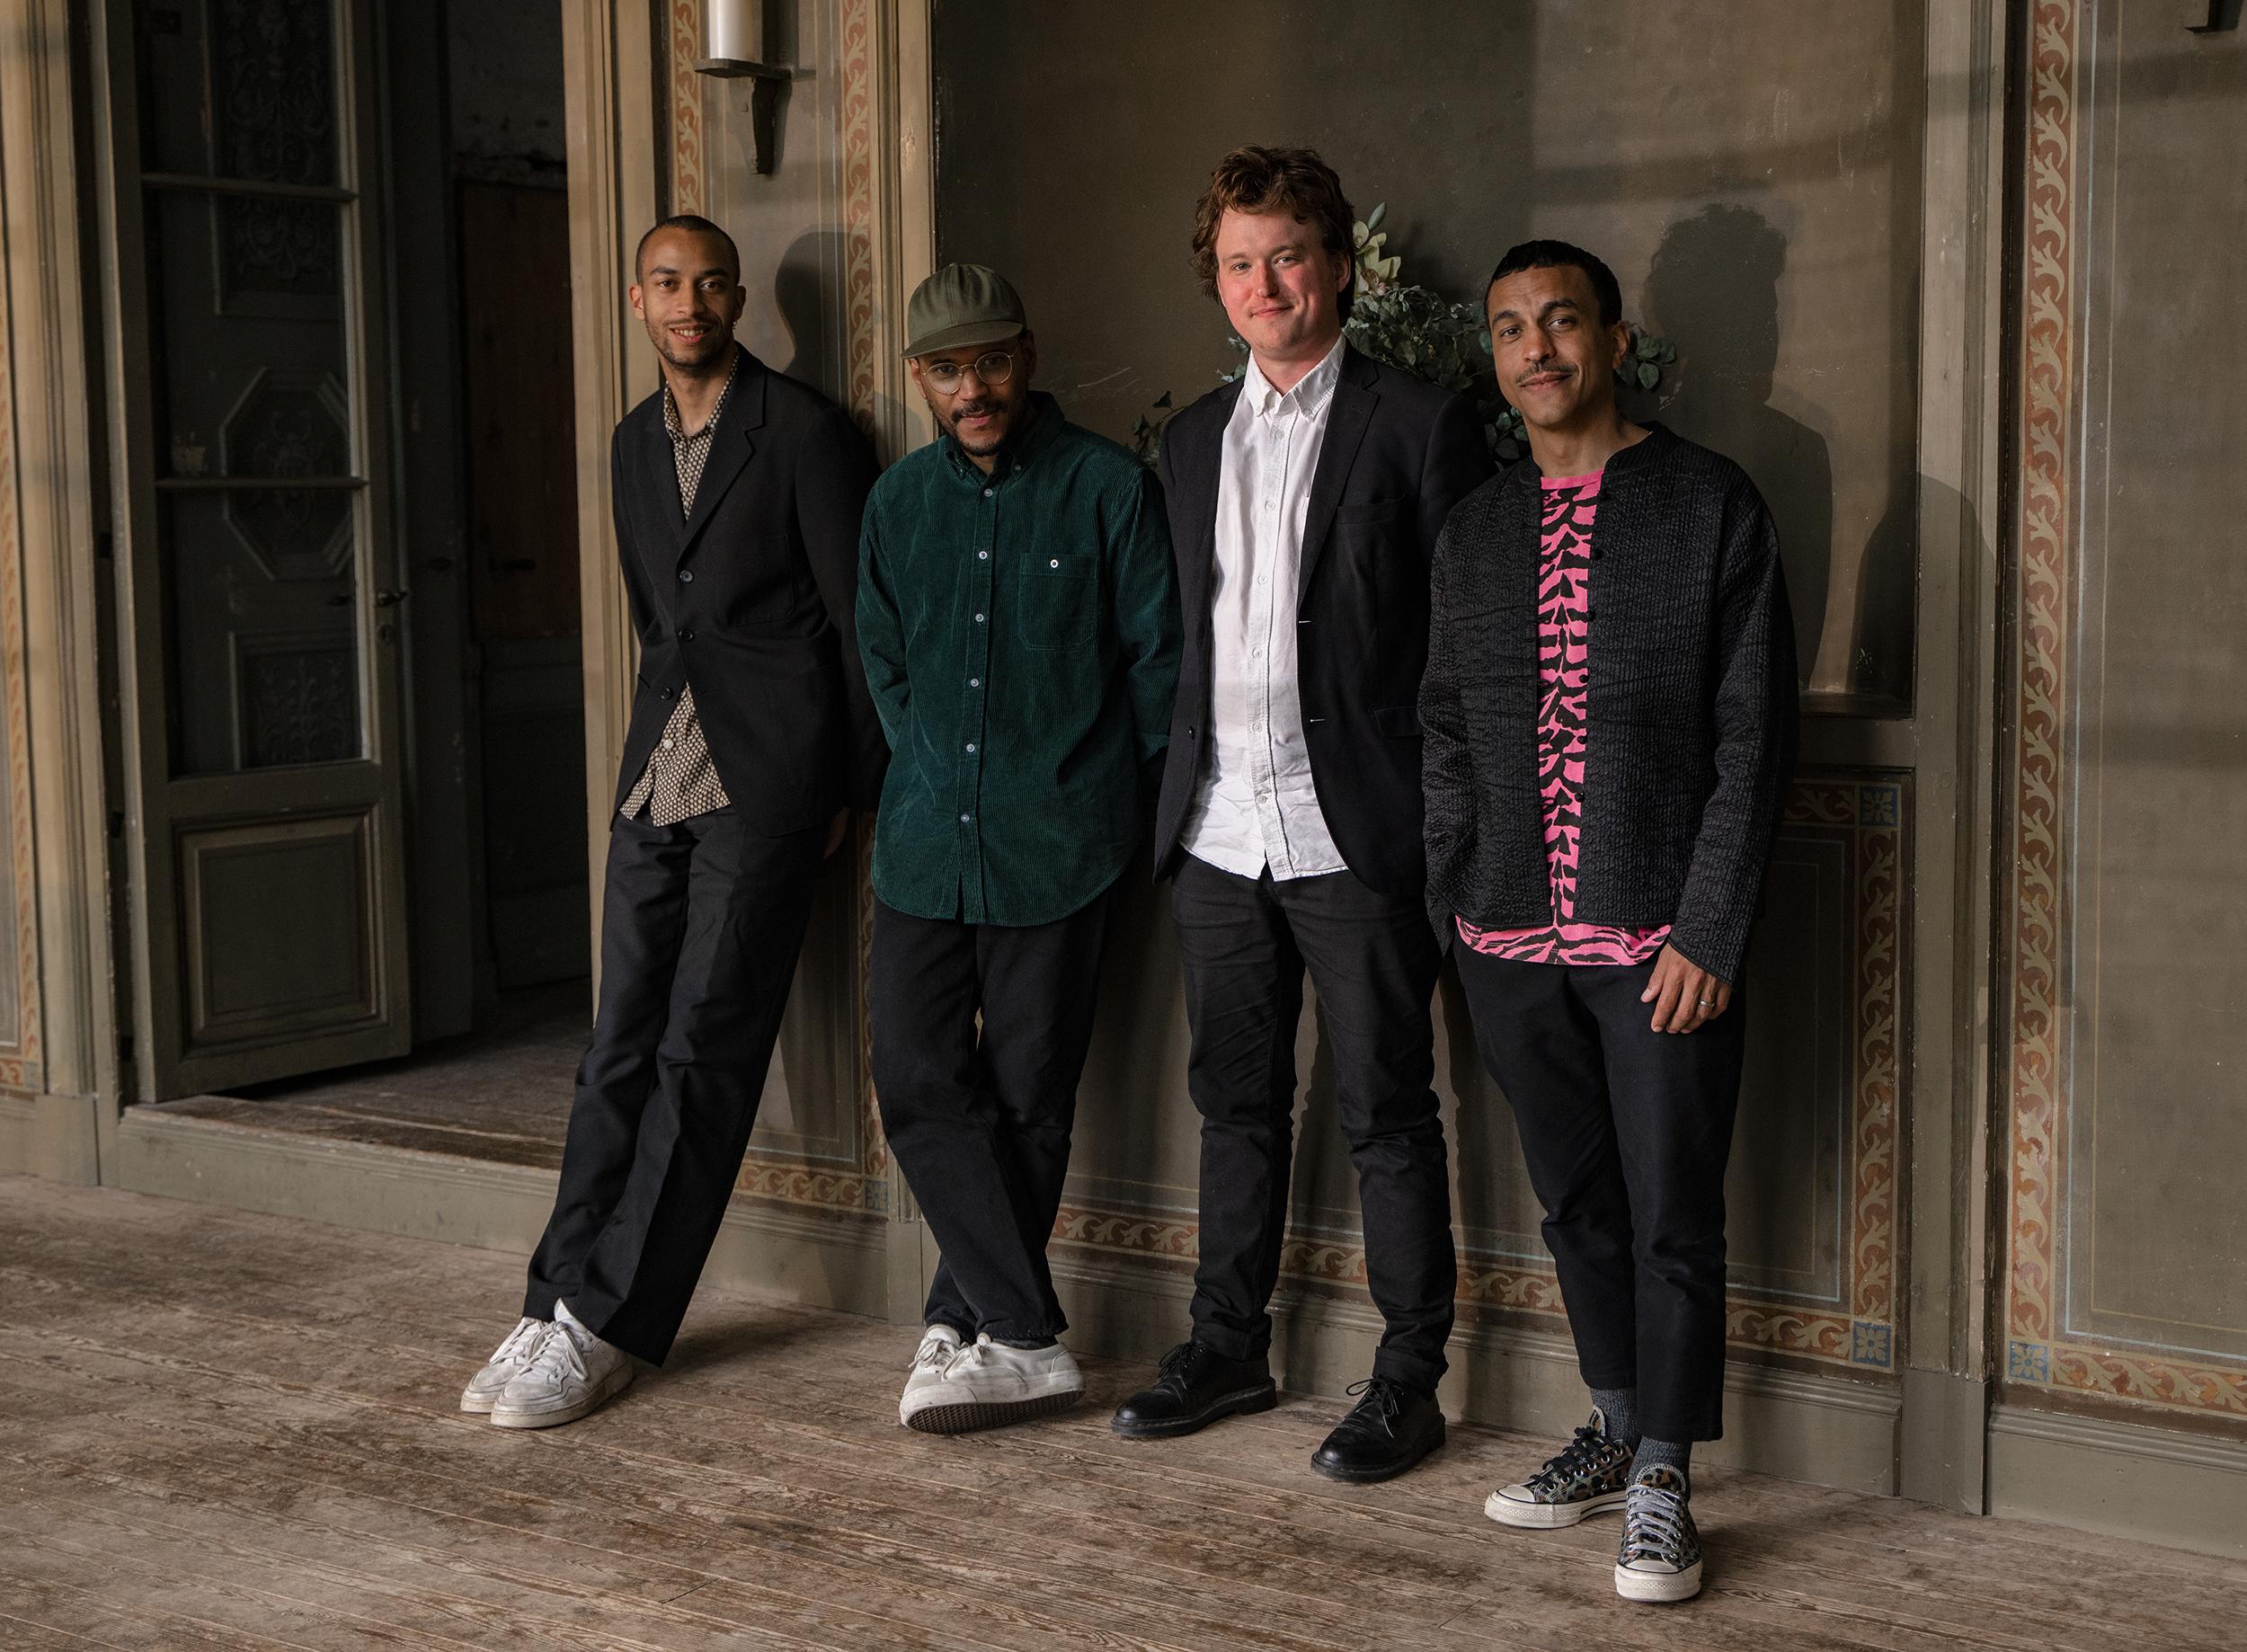 Timbuktu MASAKA Trio 2 Photo by Andreas Svensson Low Res